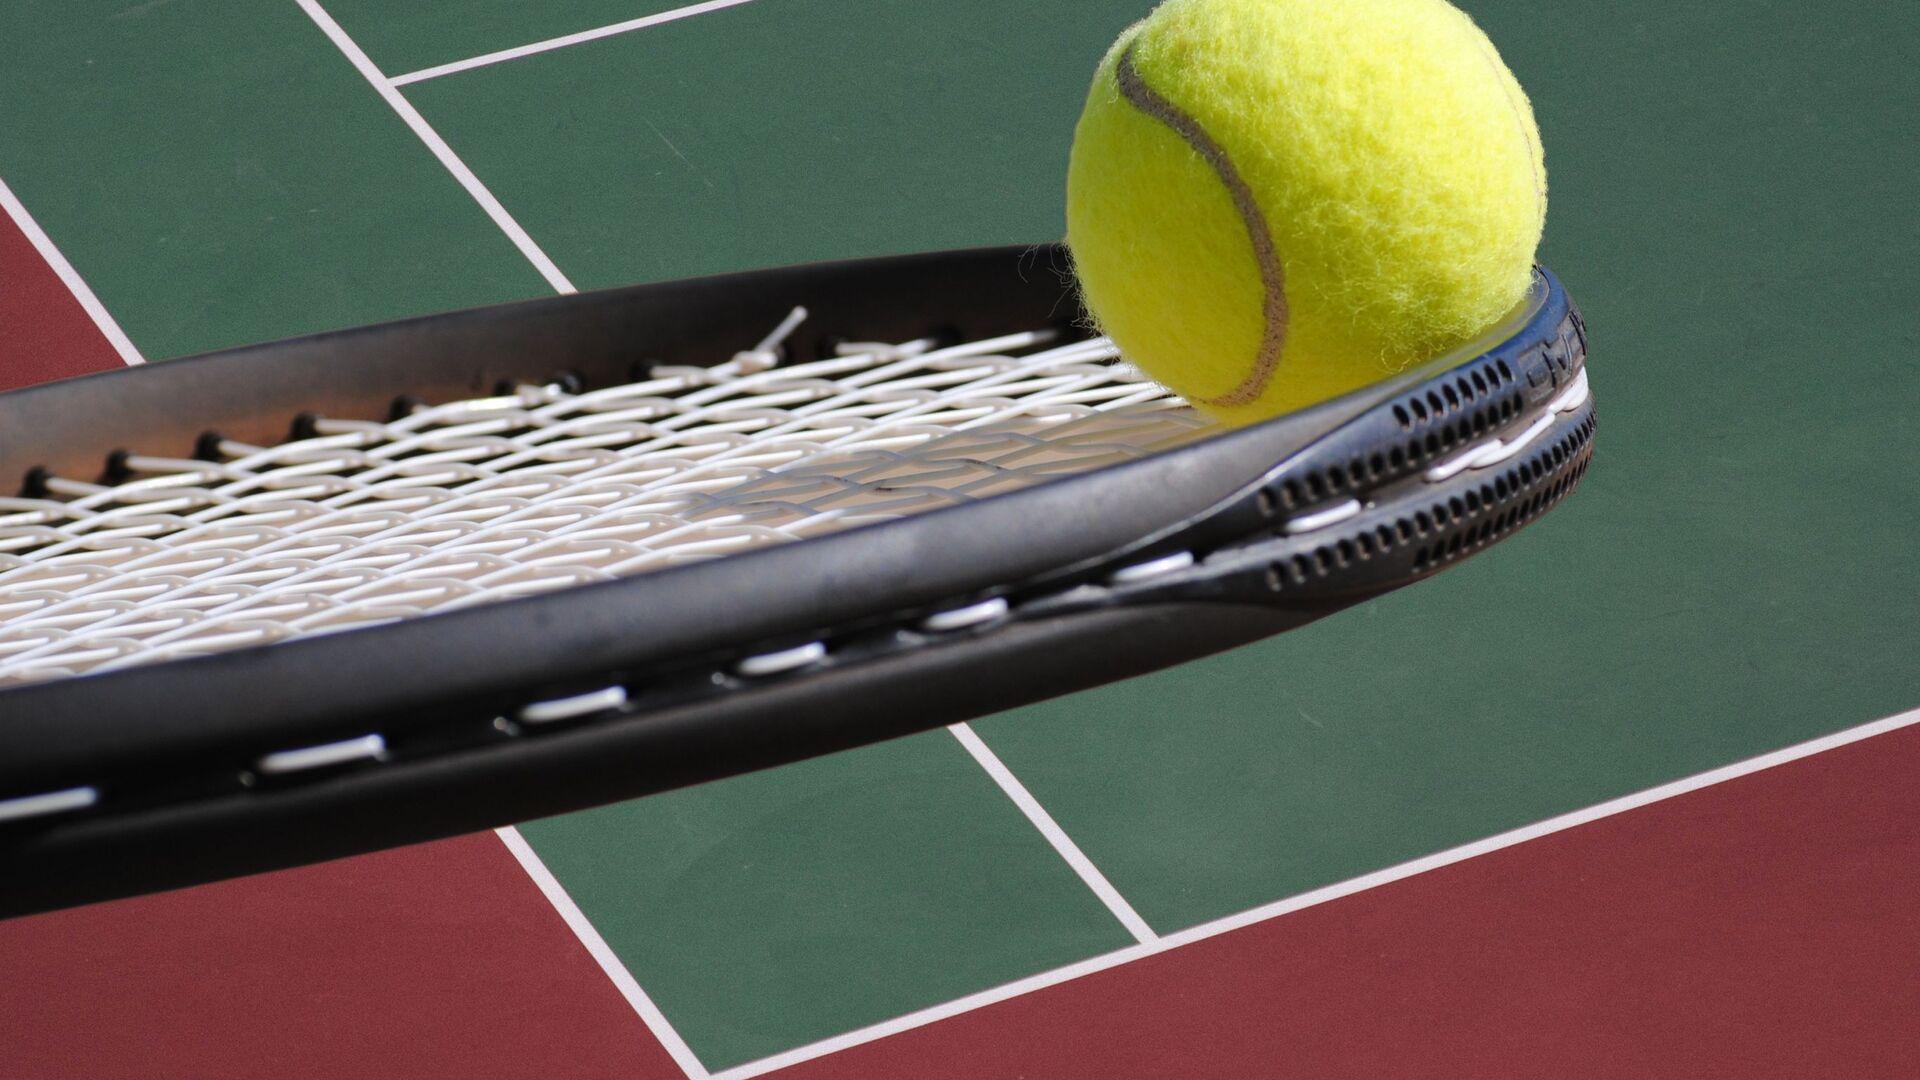 tenis-raket-tenis topu - Sputnik Türkiye, 1920, 15.09.2021